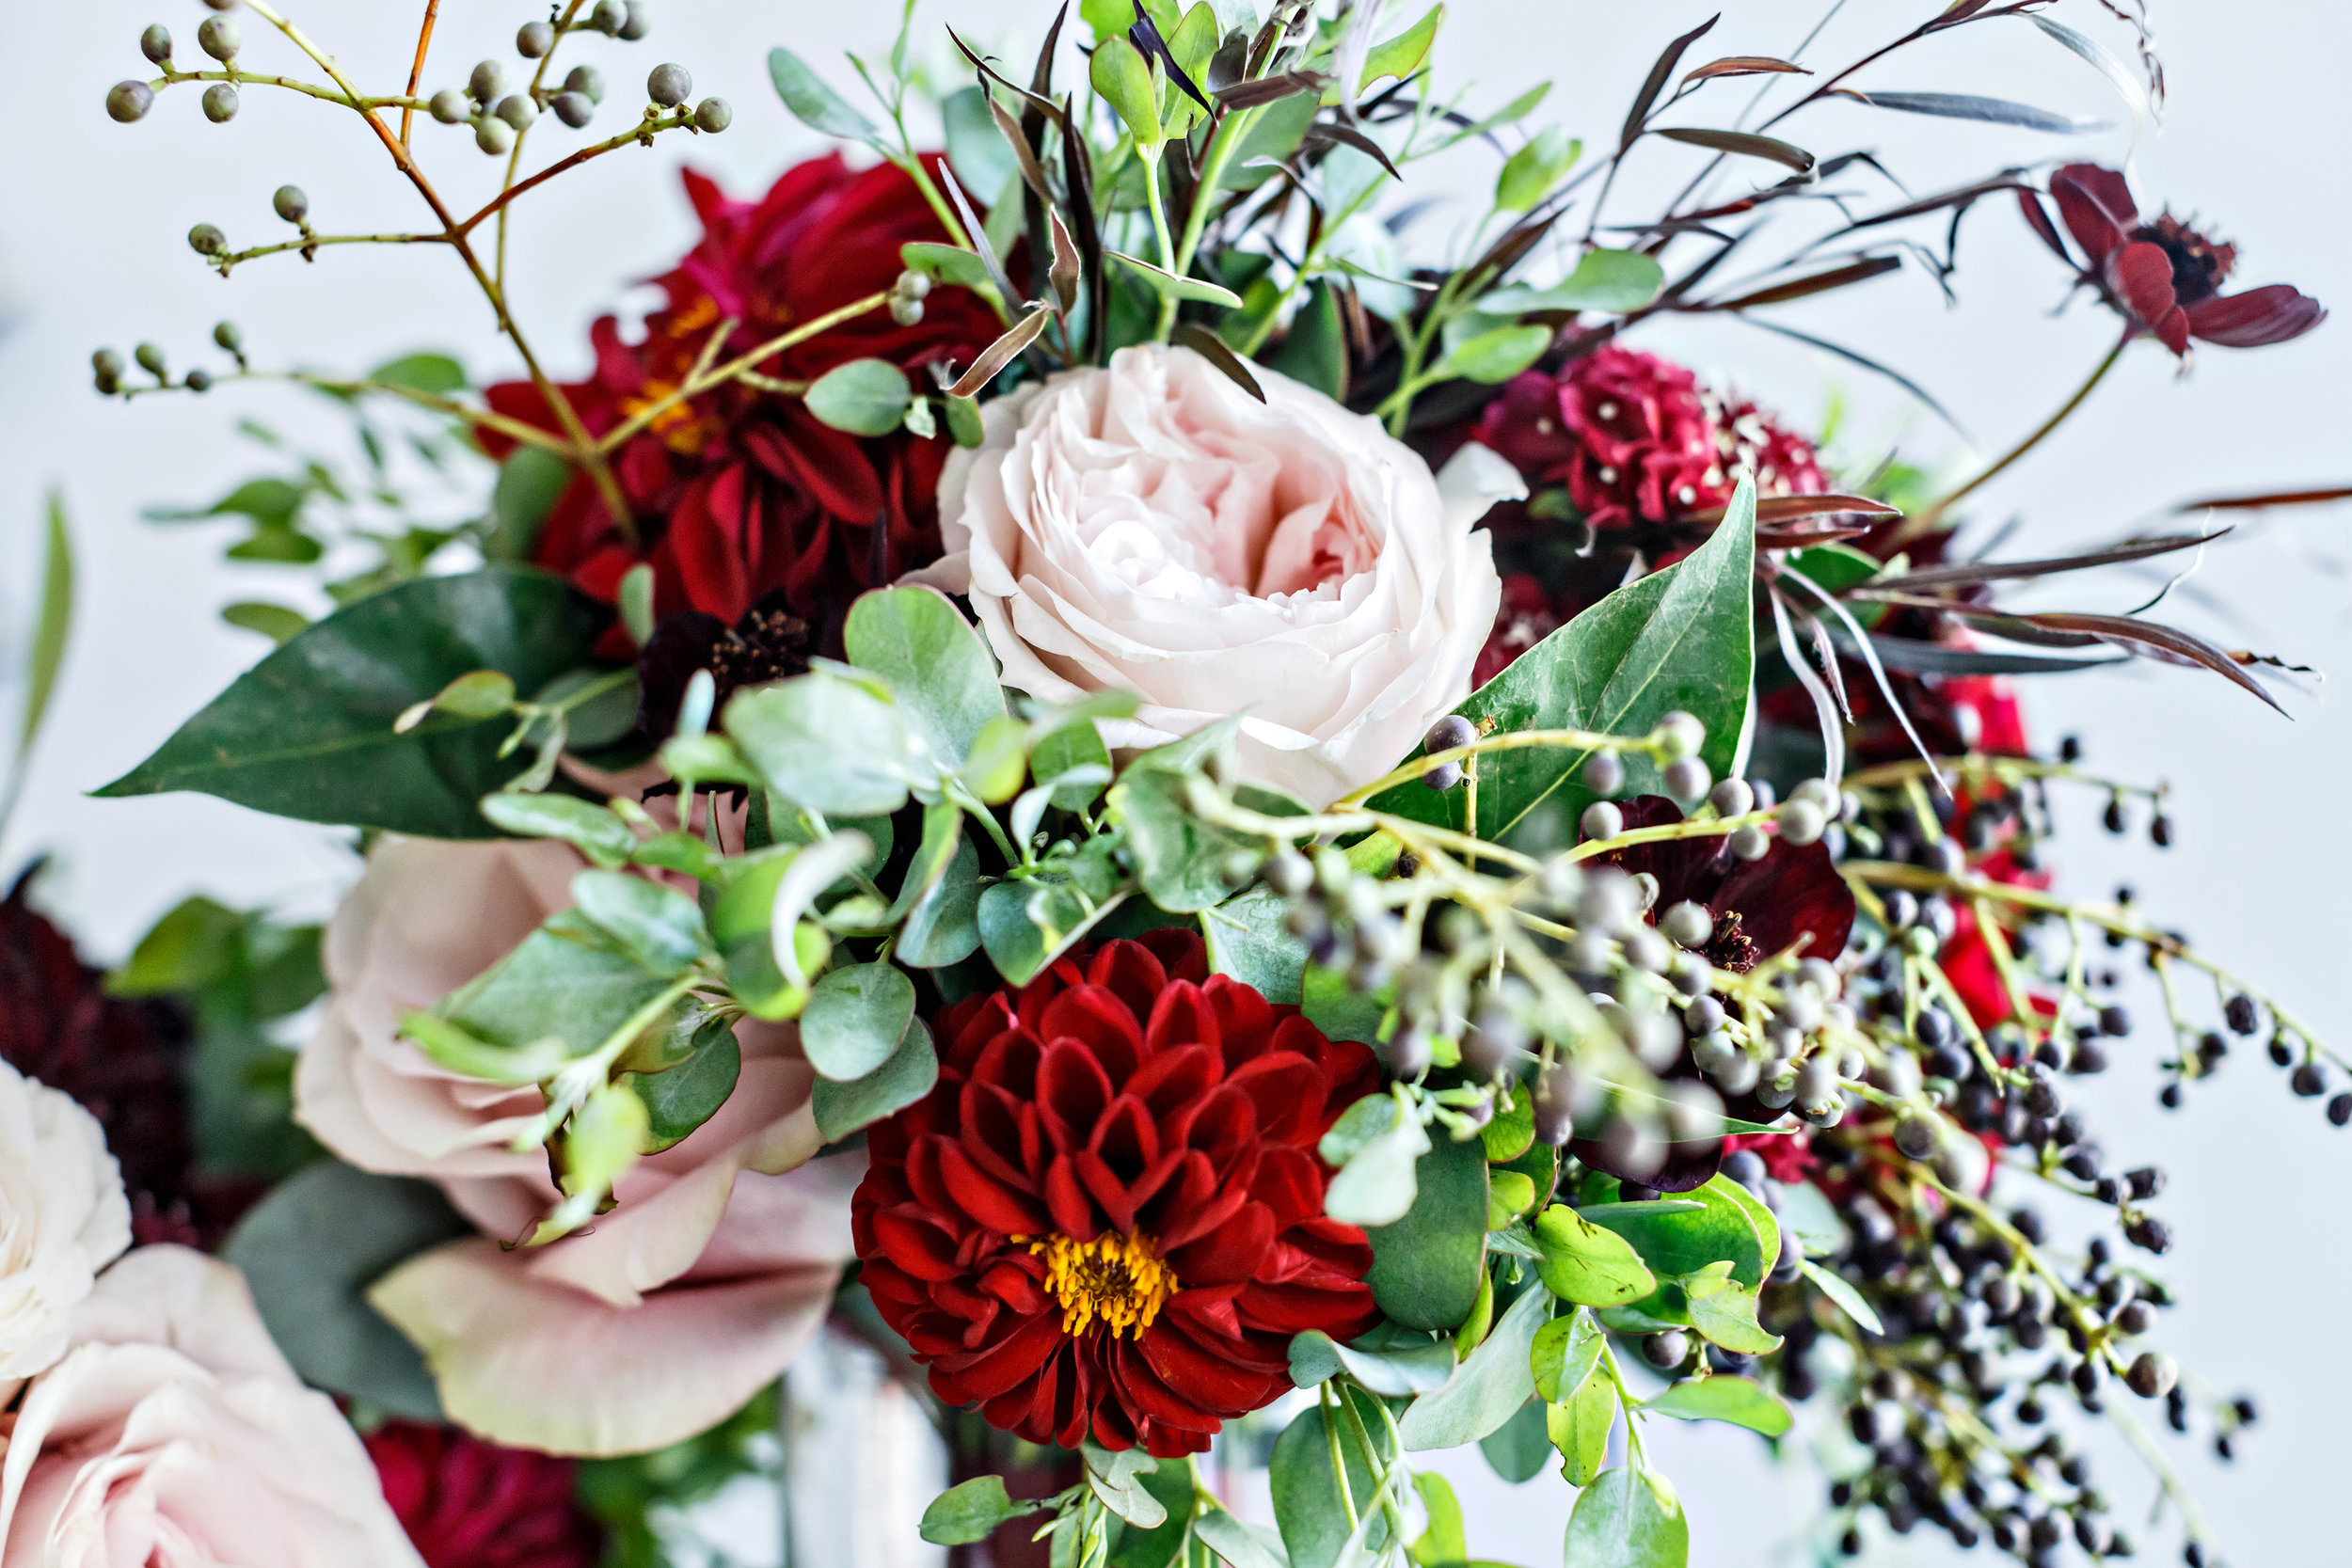 victorious-events-nyc-004-yanique-rondel-greenpoint-loft-wedding-amy-anaiz.jpg